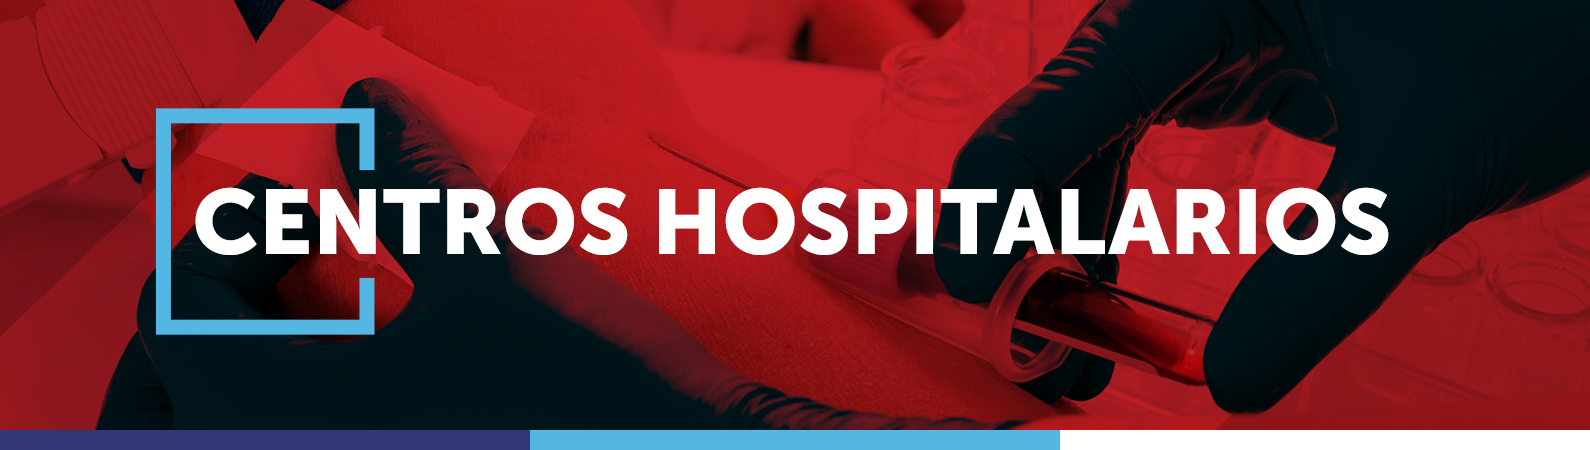 centros-hospitalarios